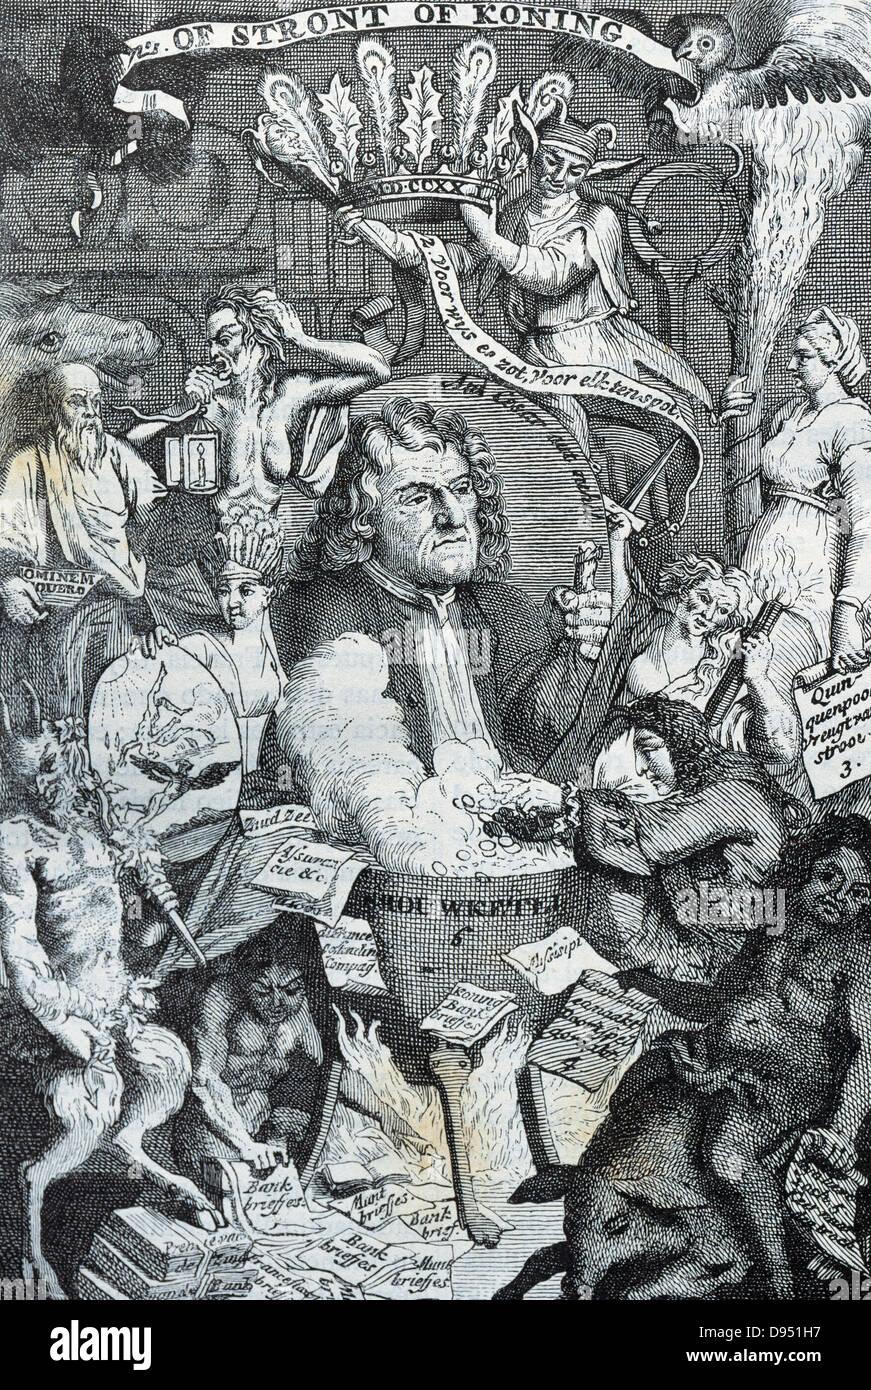 John Law (1671–1729). Scottish economist. Dutch satirical engraving. - Stock Image